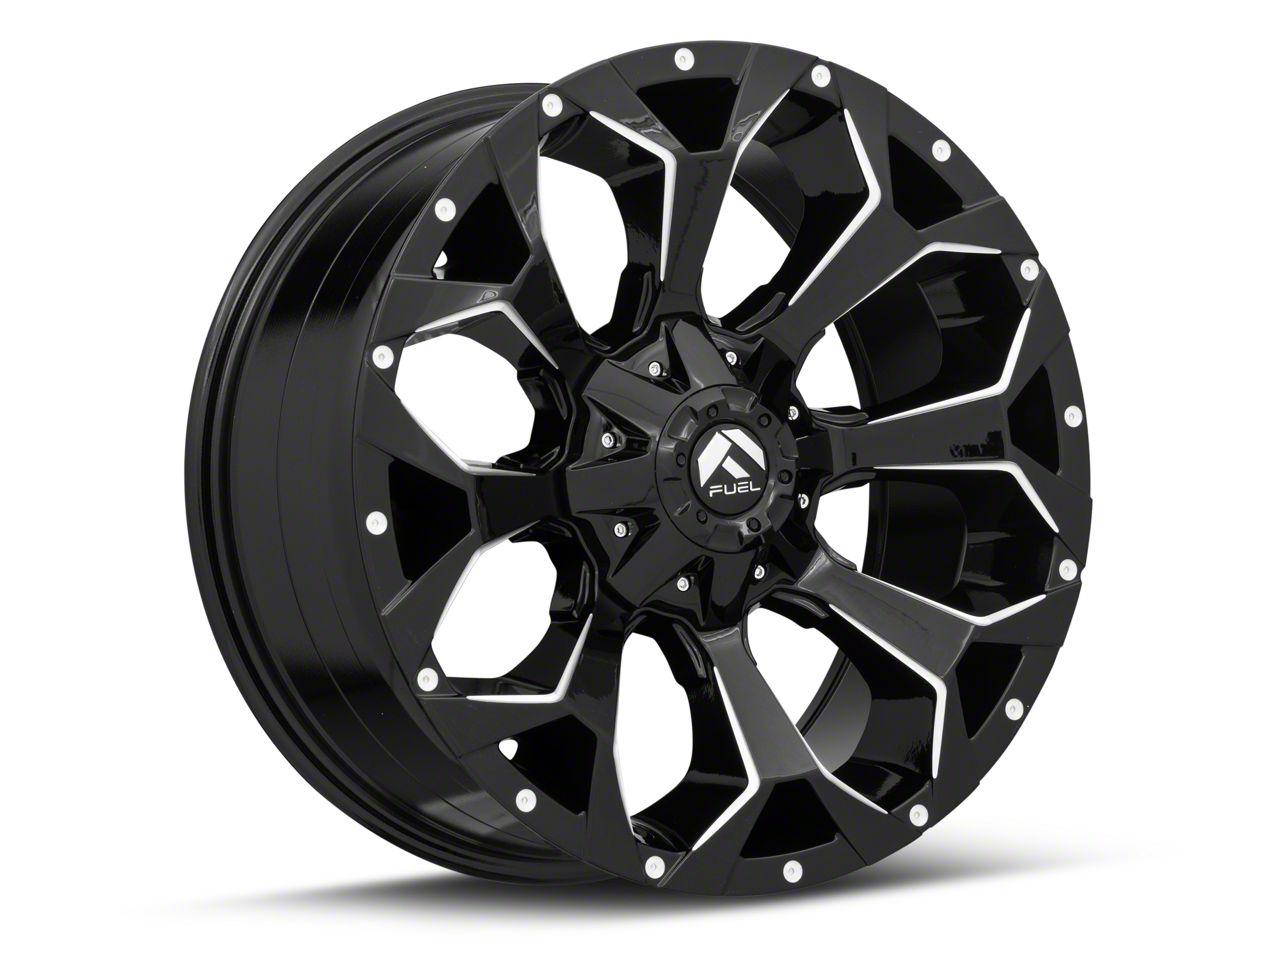 Fuel Wheels Assault Gloss Black 6-Lug Wheel - 20x9 (07-18 Sierra 1500)